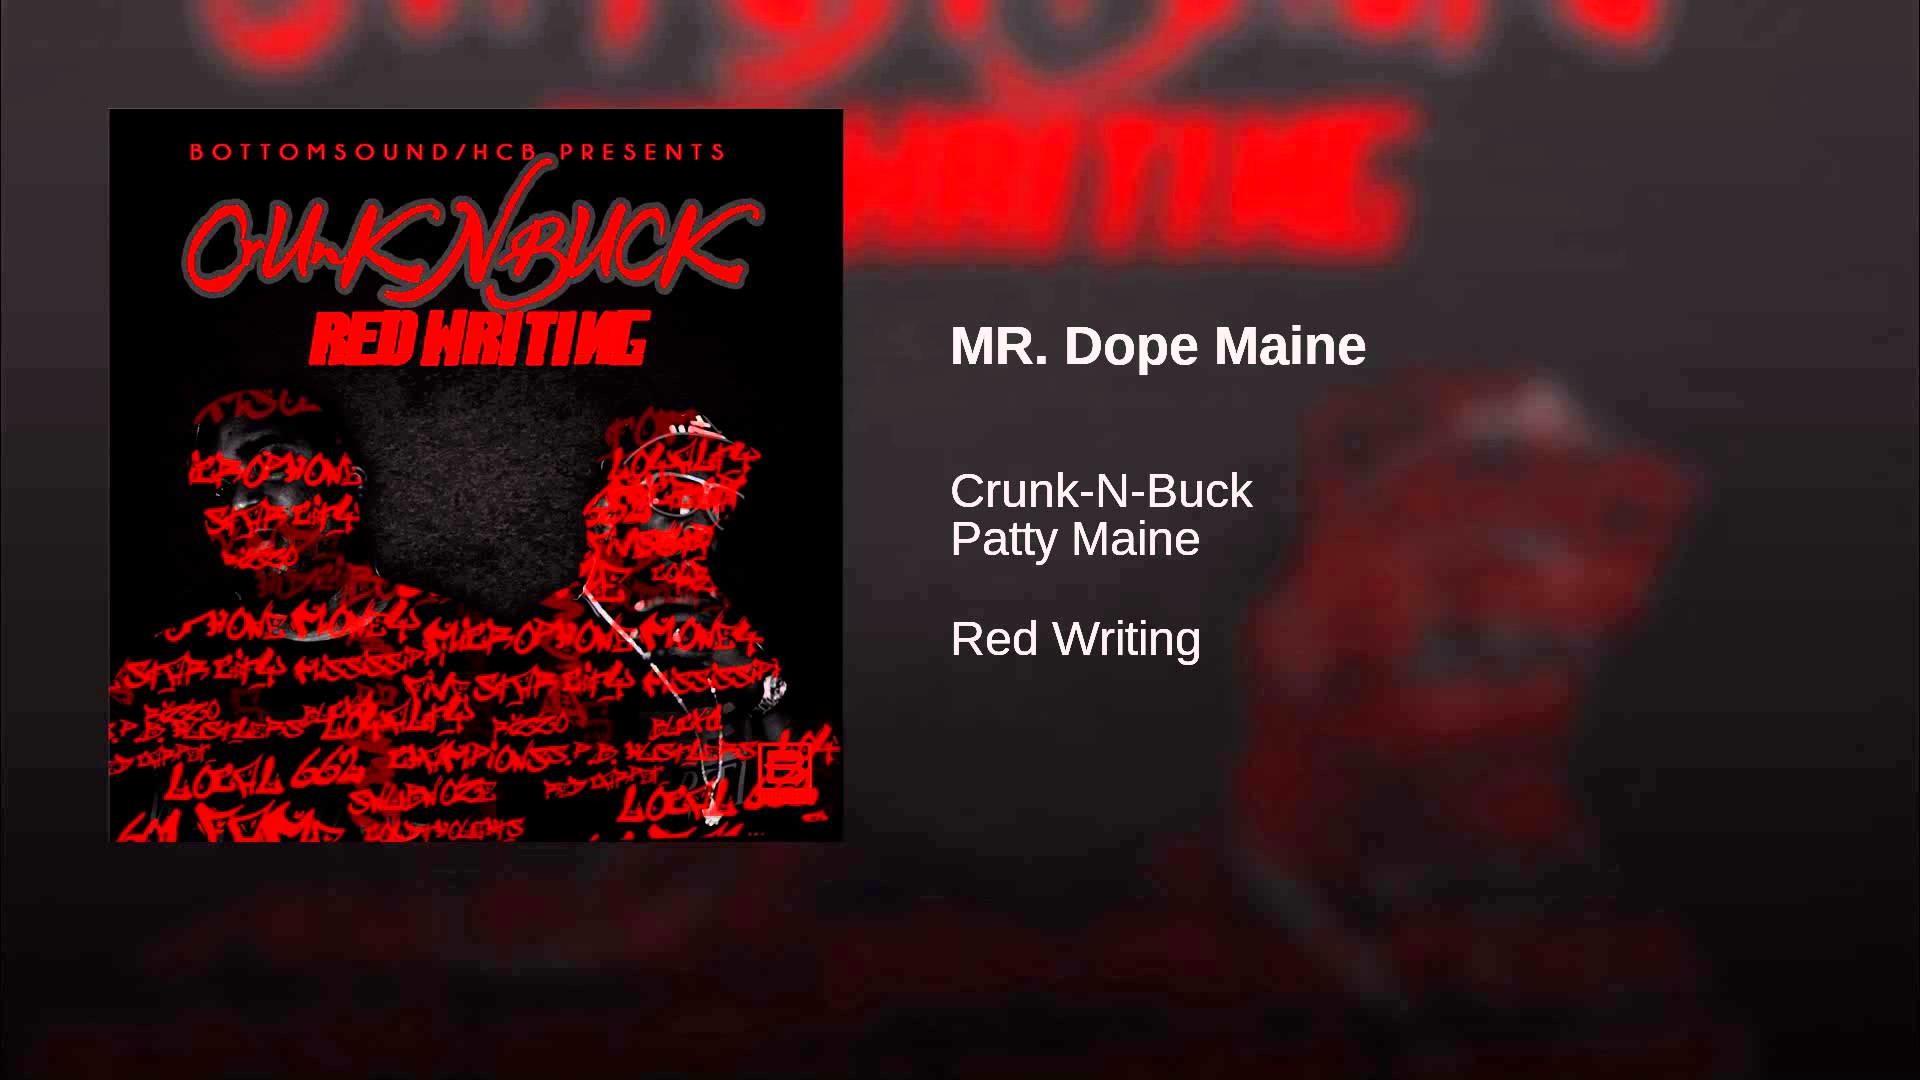 Dope Maine